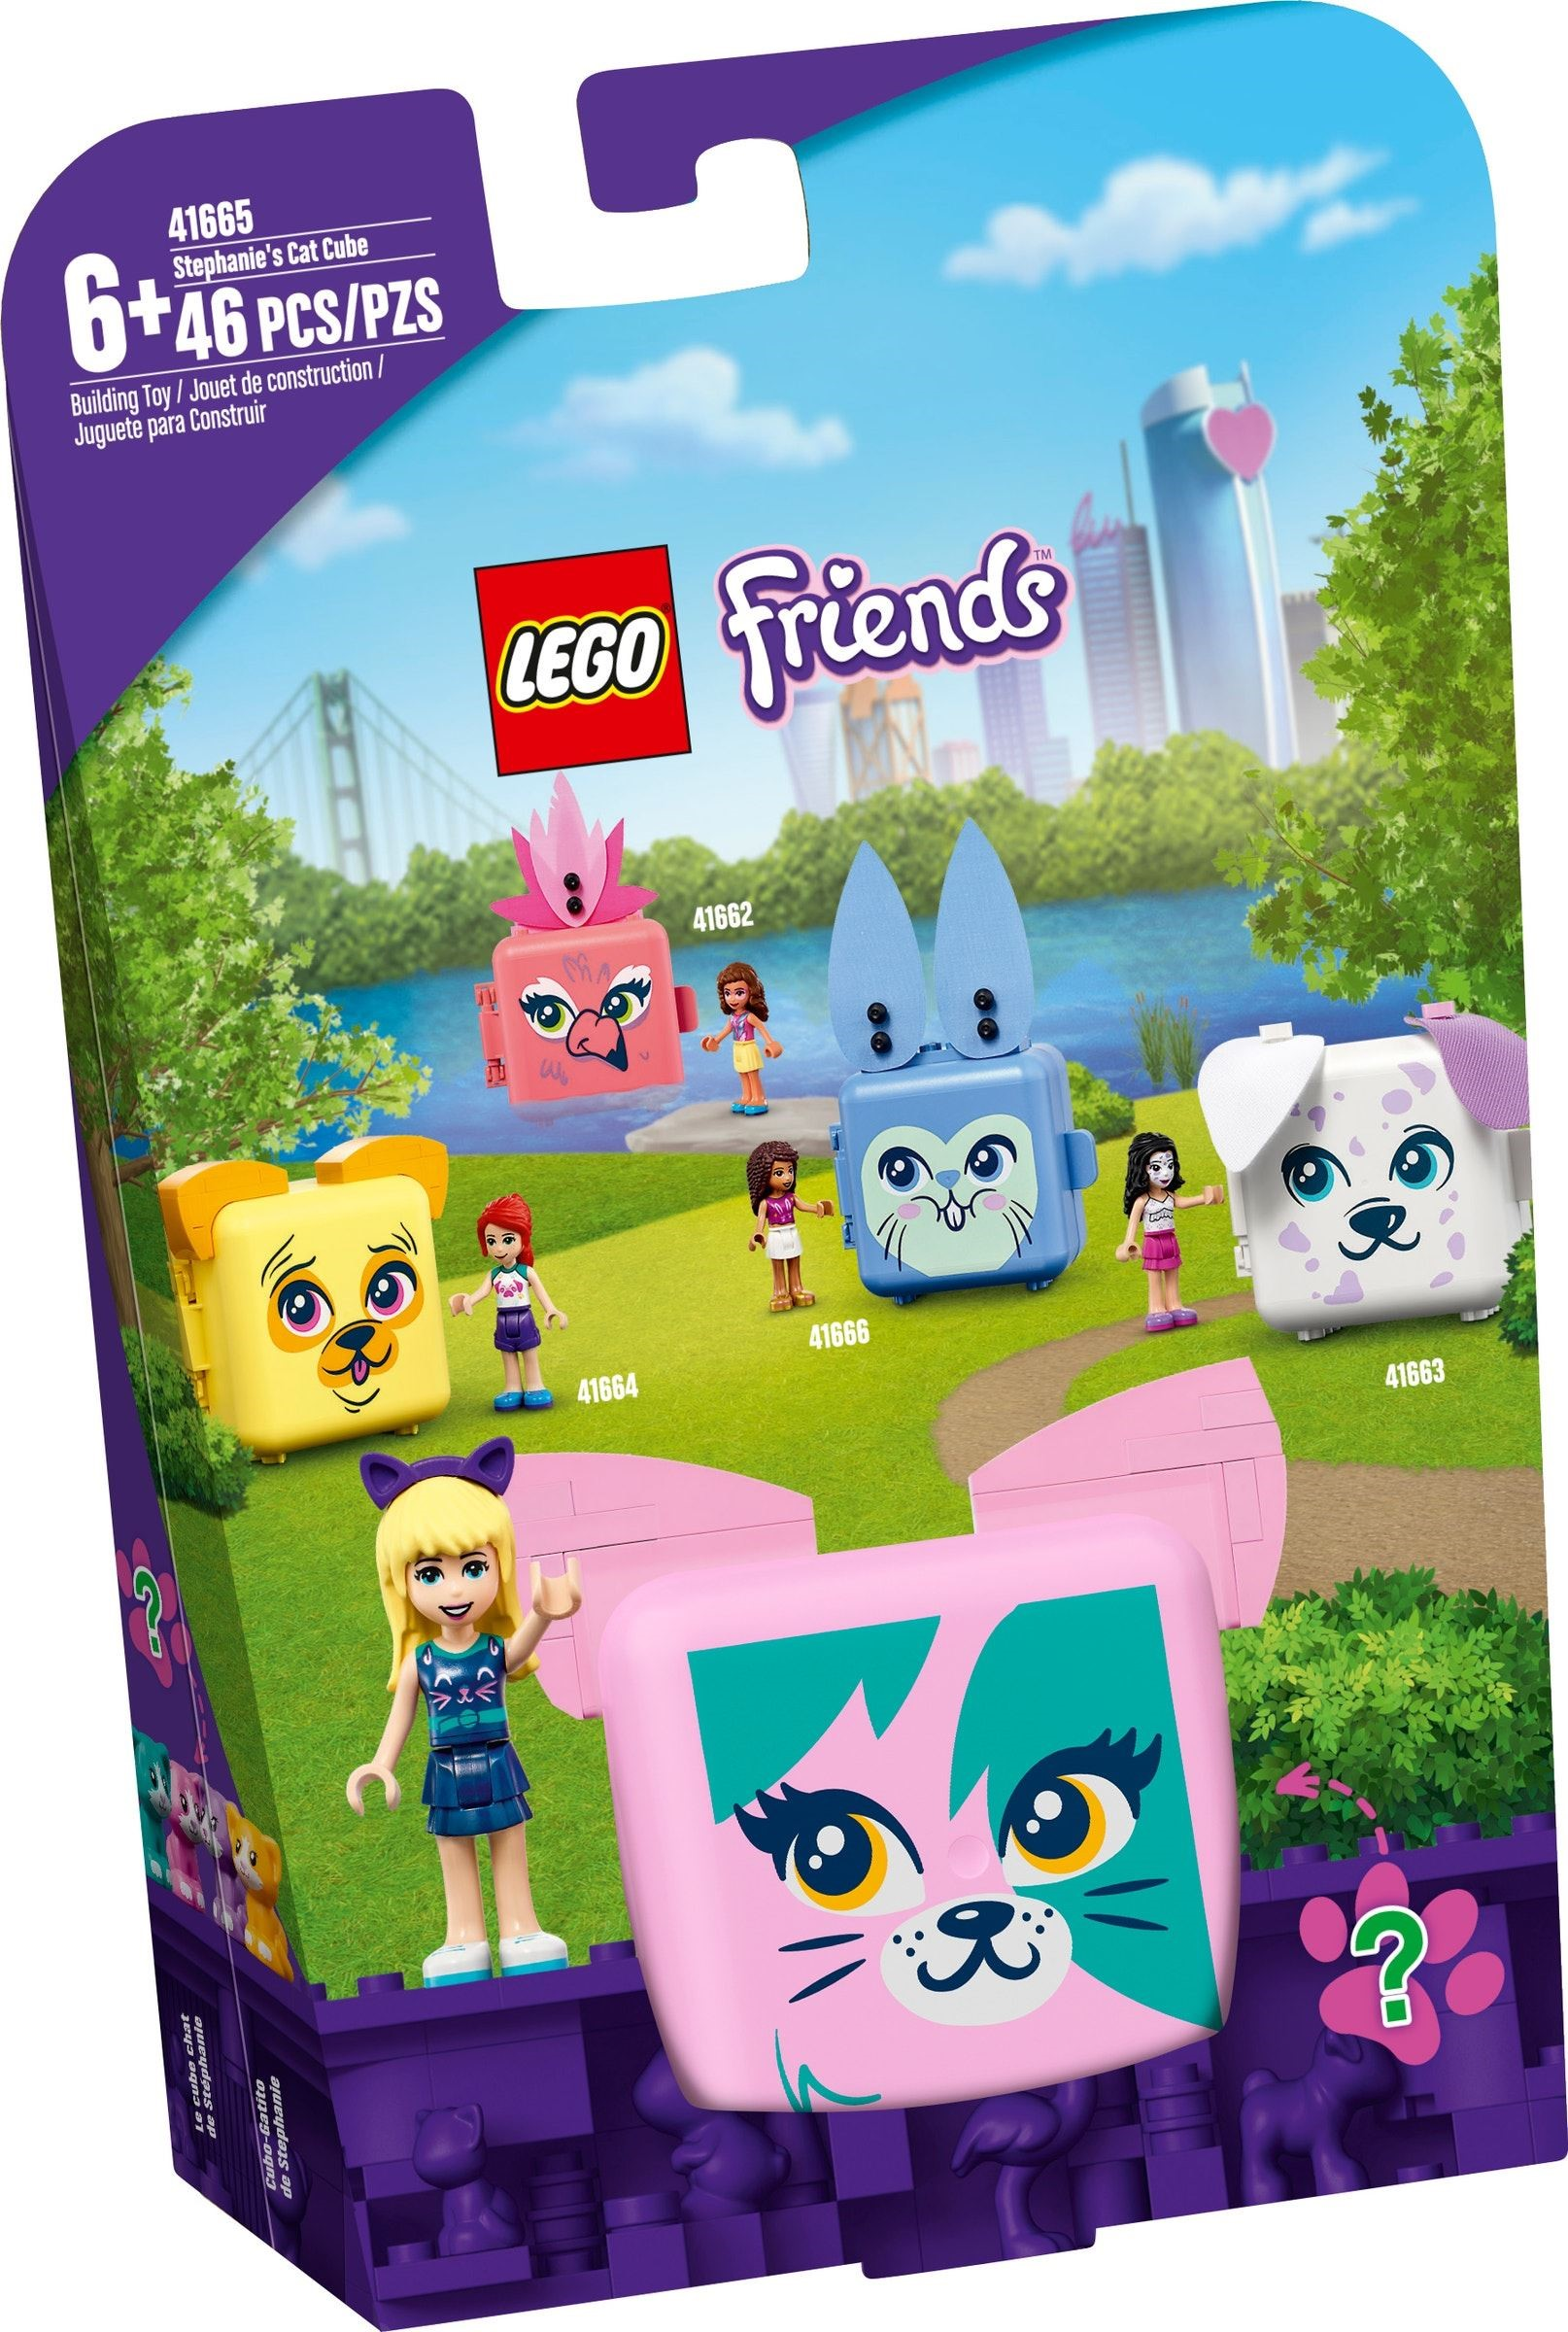 LEGO Friends - Stephanie's Cat Cube (41665)